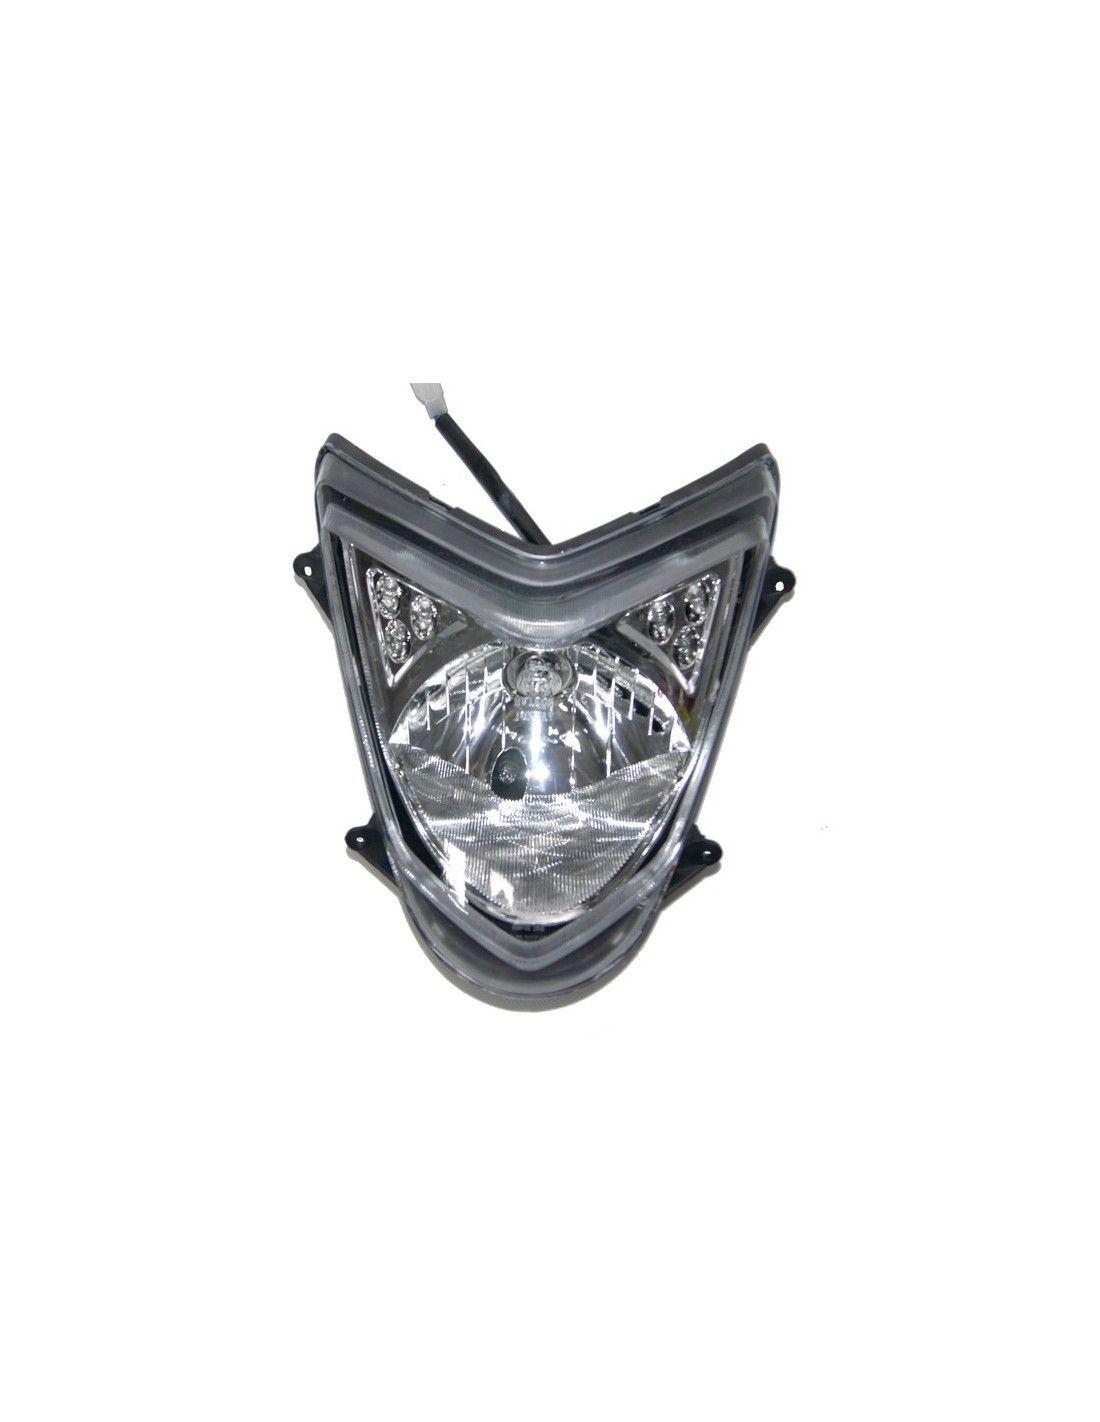 Lampa przednia Kingway Coliber Fartt